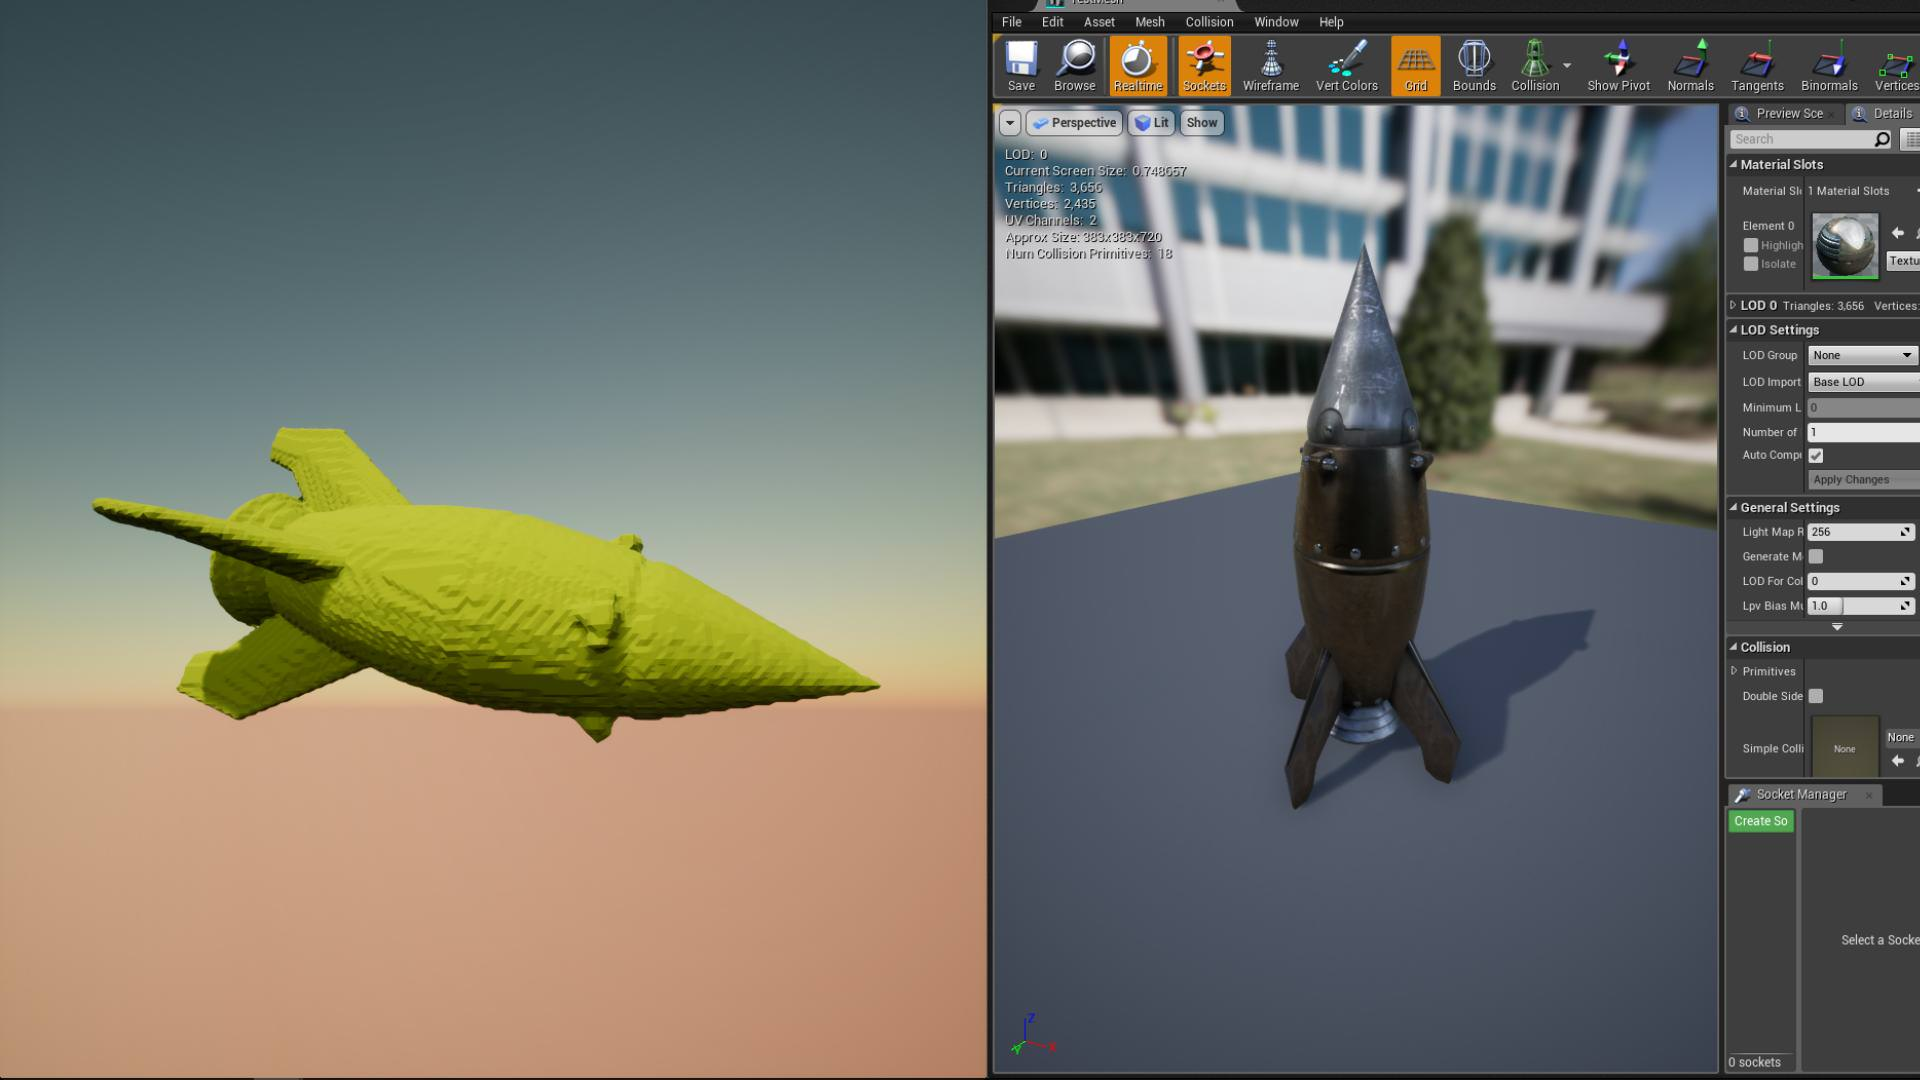 Import Meshes, Heightmaps, Landscape, Splines, MagicaVox assets, 3D Coat assets (Pro only)